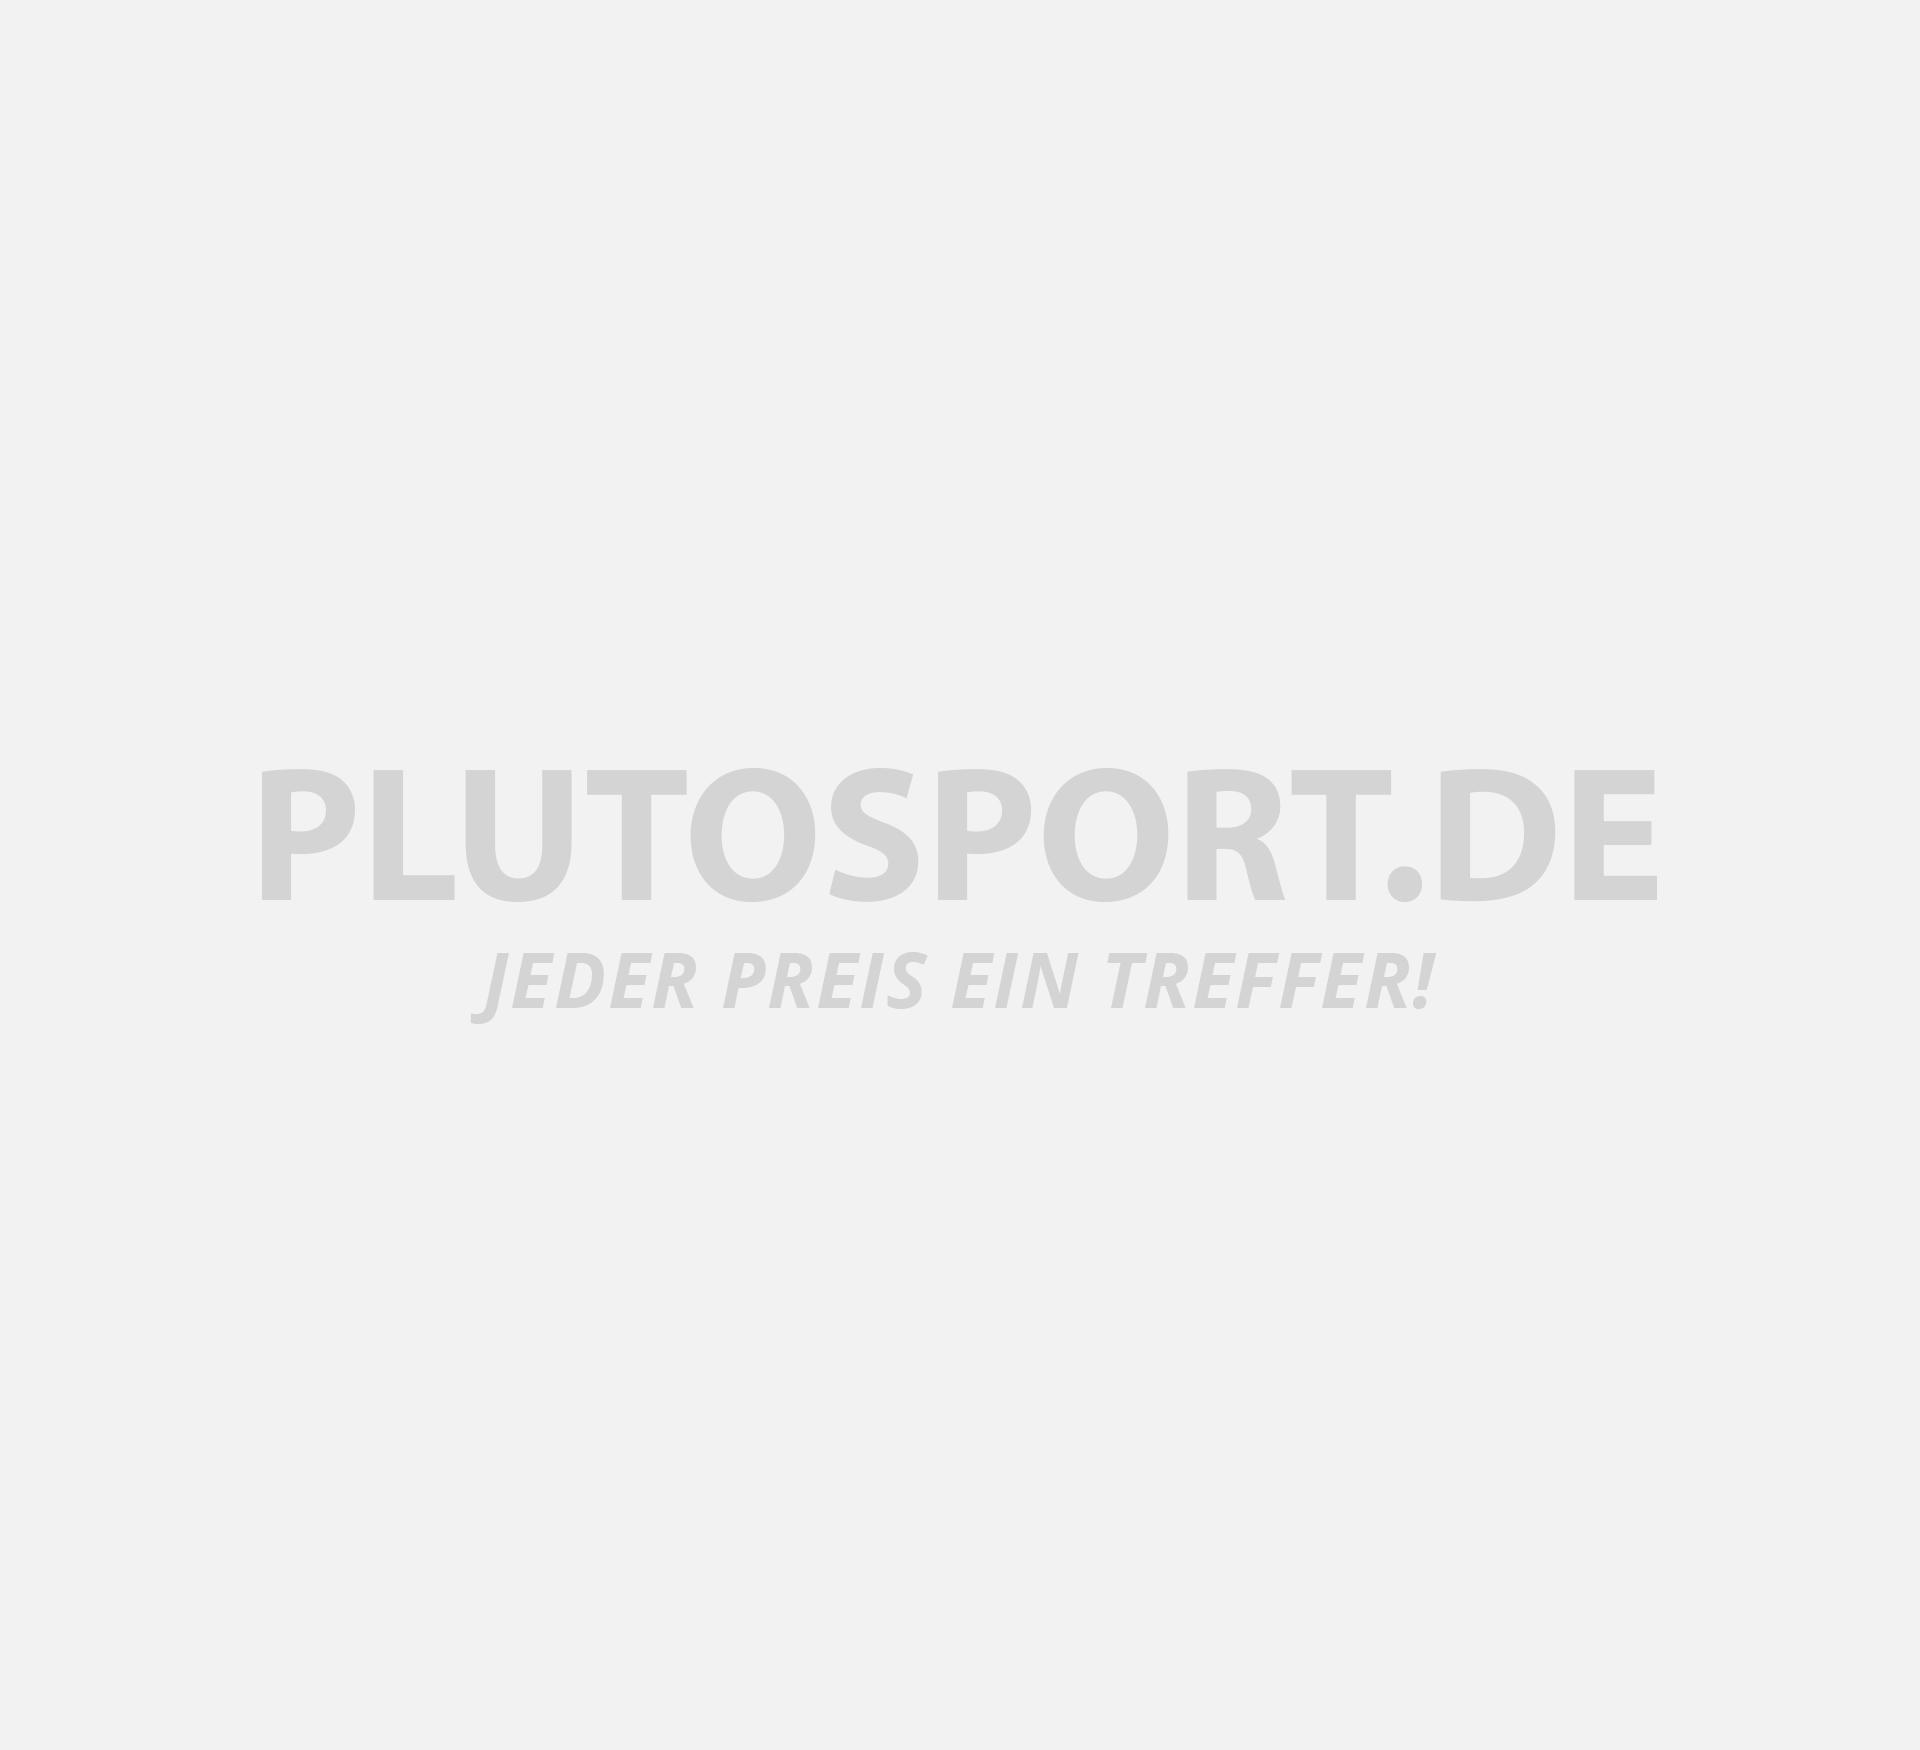 Nike Hypervenom Phelon 3 DF AG-Pro